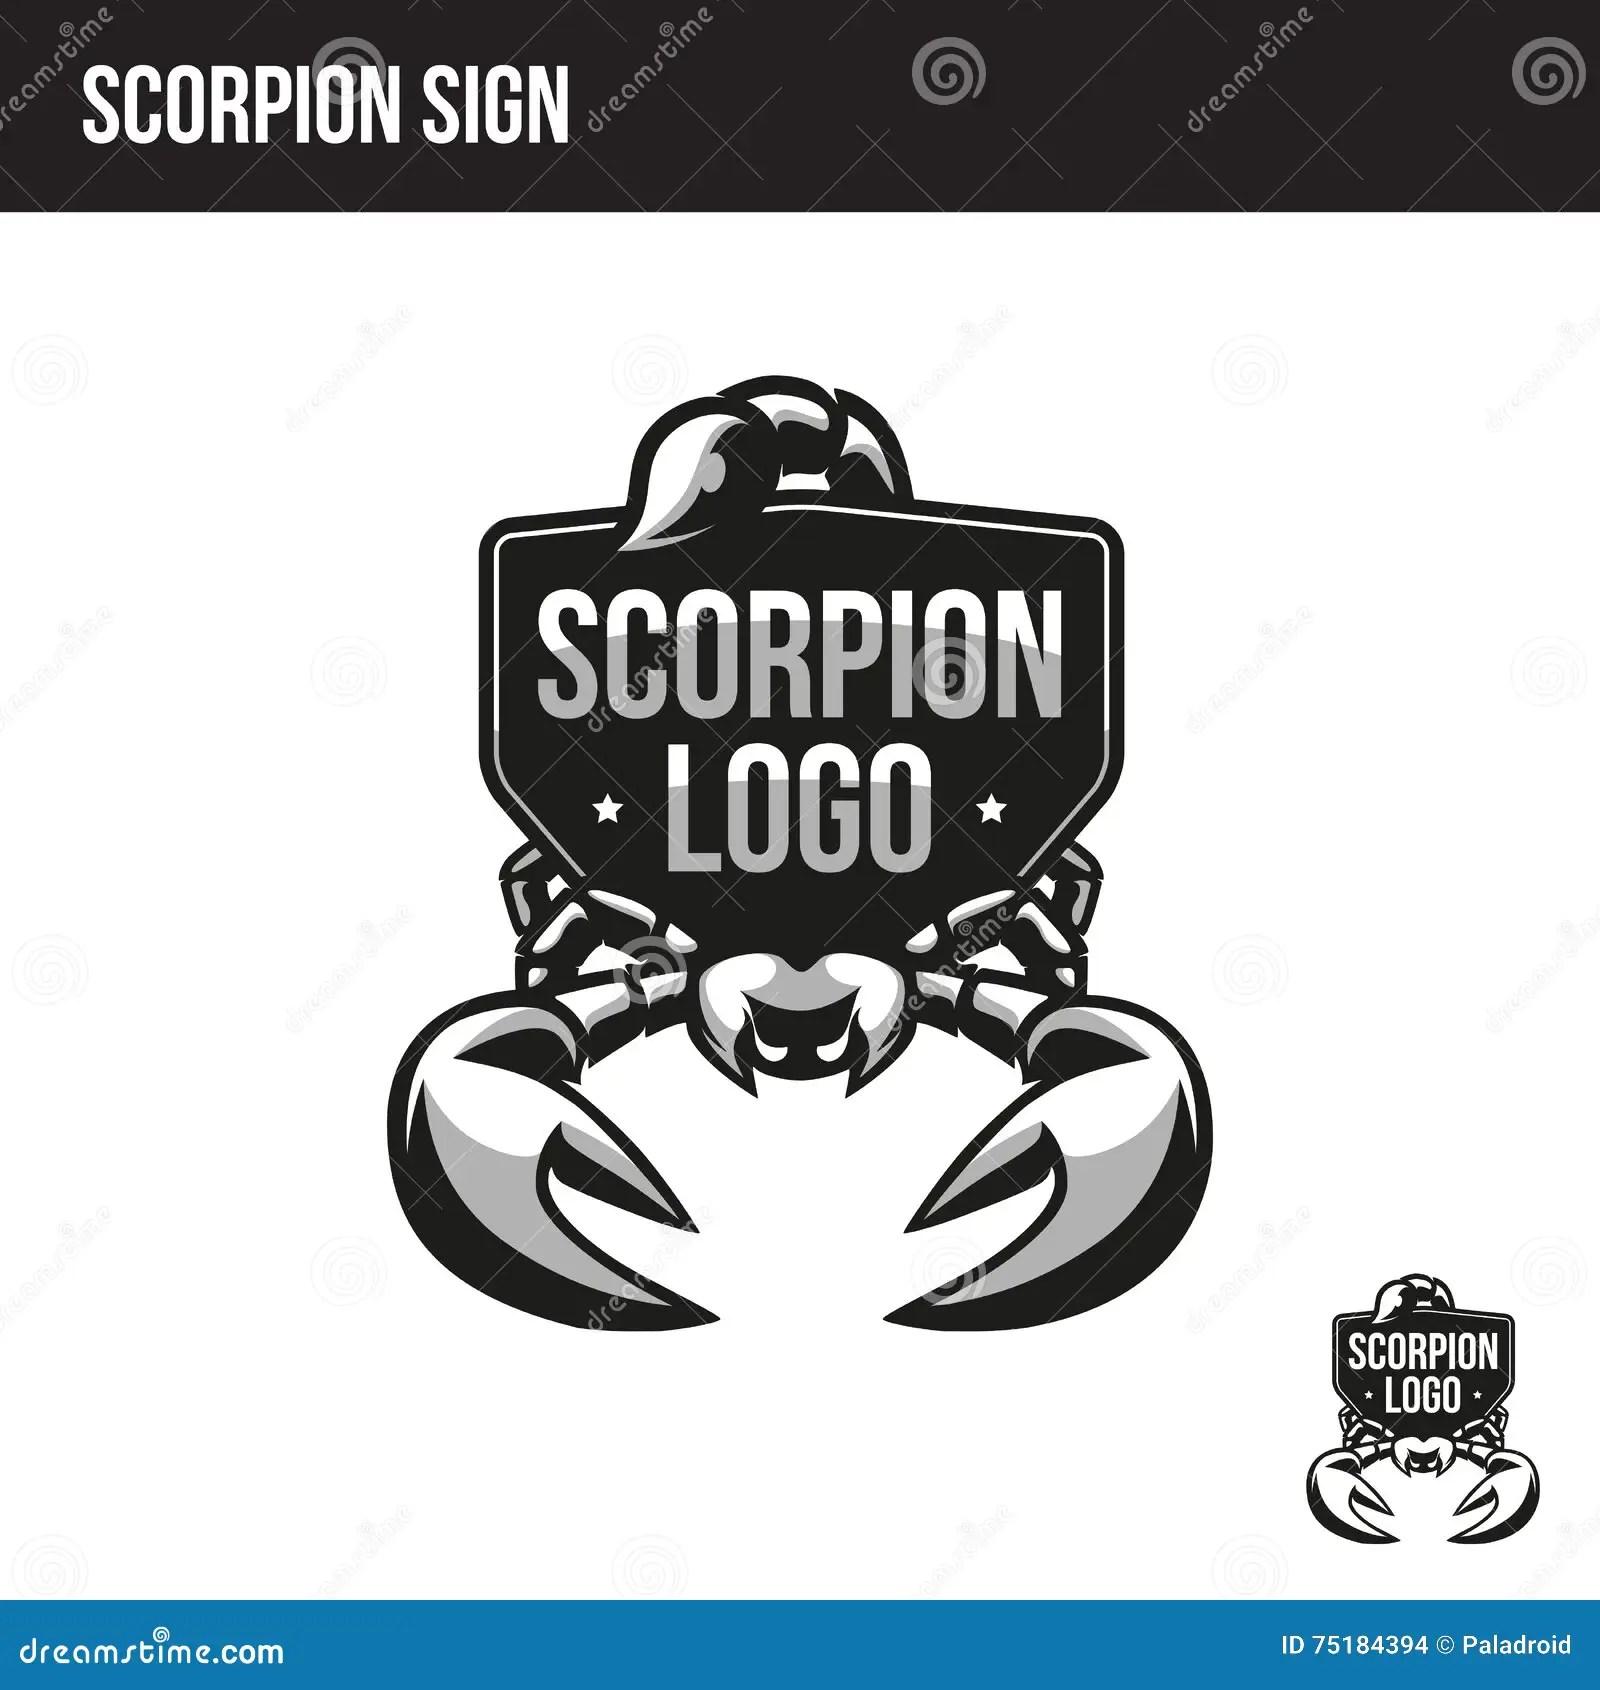 Scorpion Logo Design Vector Illustration